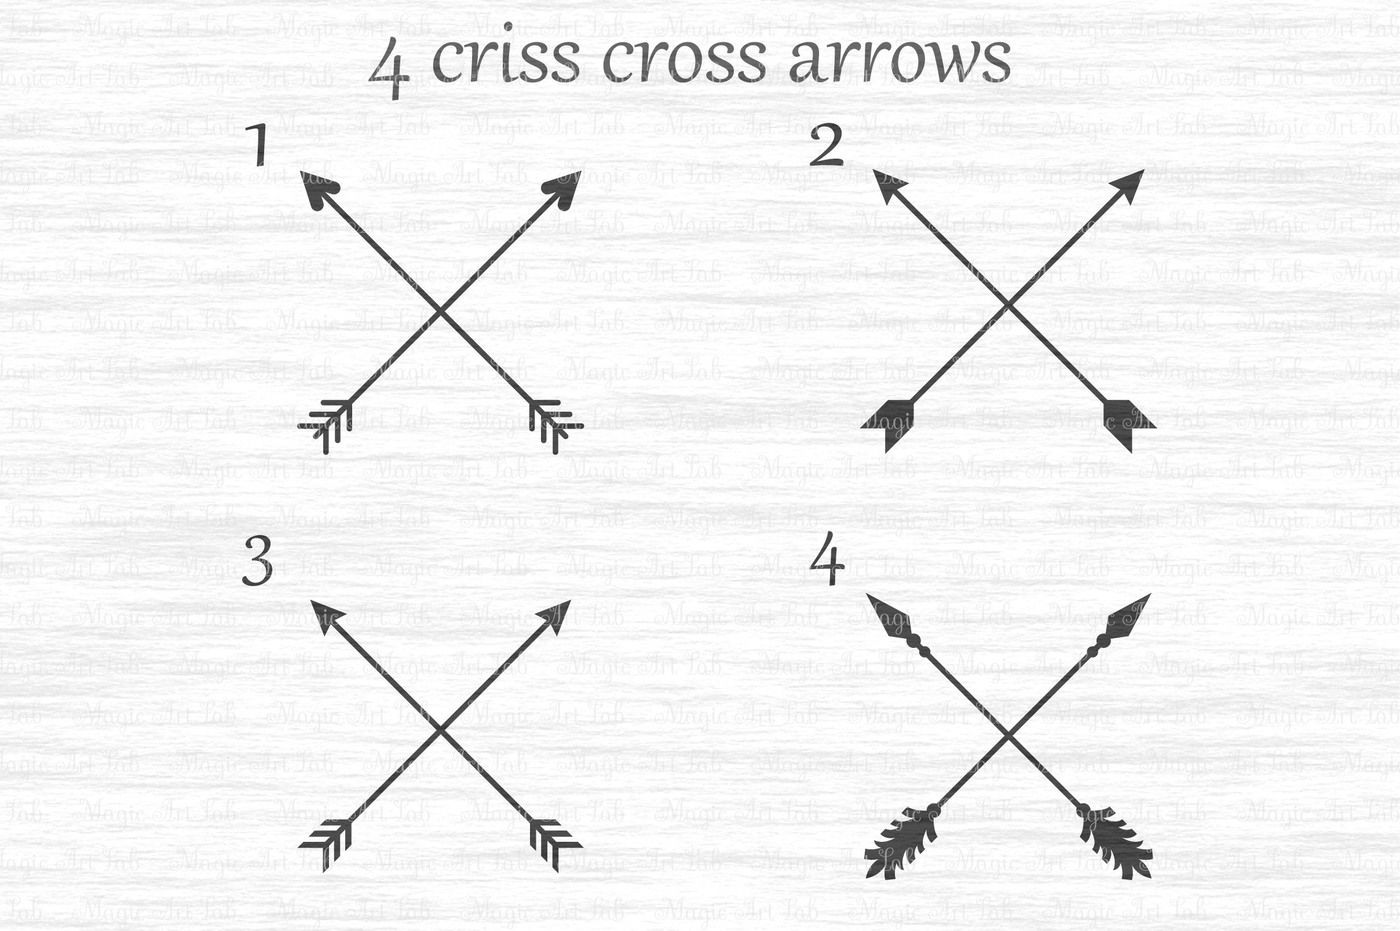 Arrows Arrow Monograms Svg Dxf Eps Ai Png Pdf Jpeg By Magicartlab Thehungryjpeg Com Svg Sponsored Dxf X Tattoo Tattoo Ideen Klein Kompasstattoo